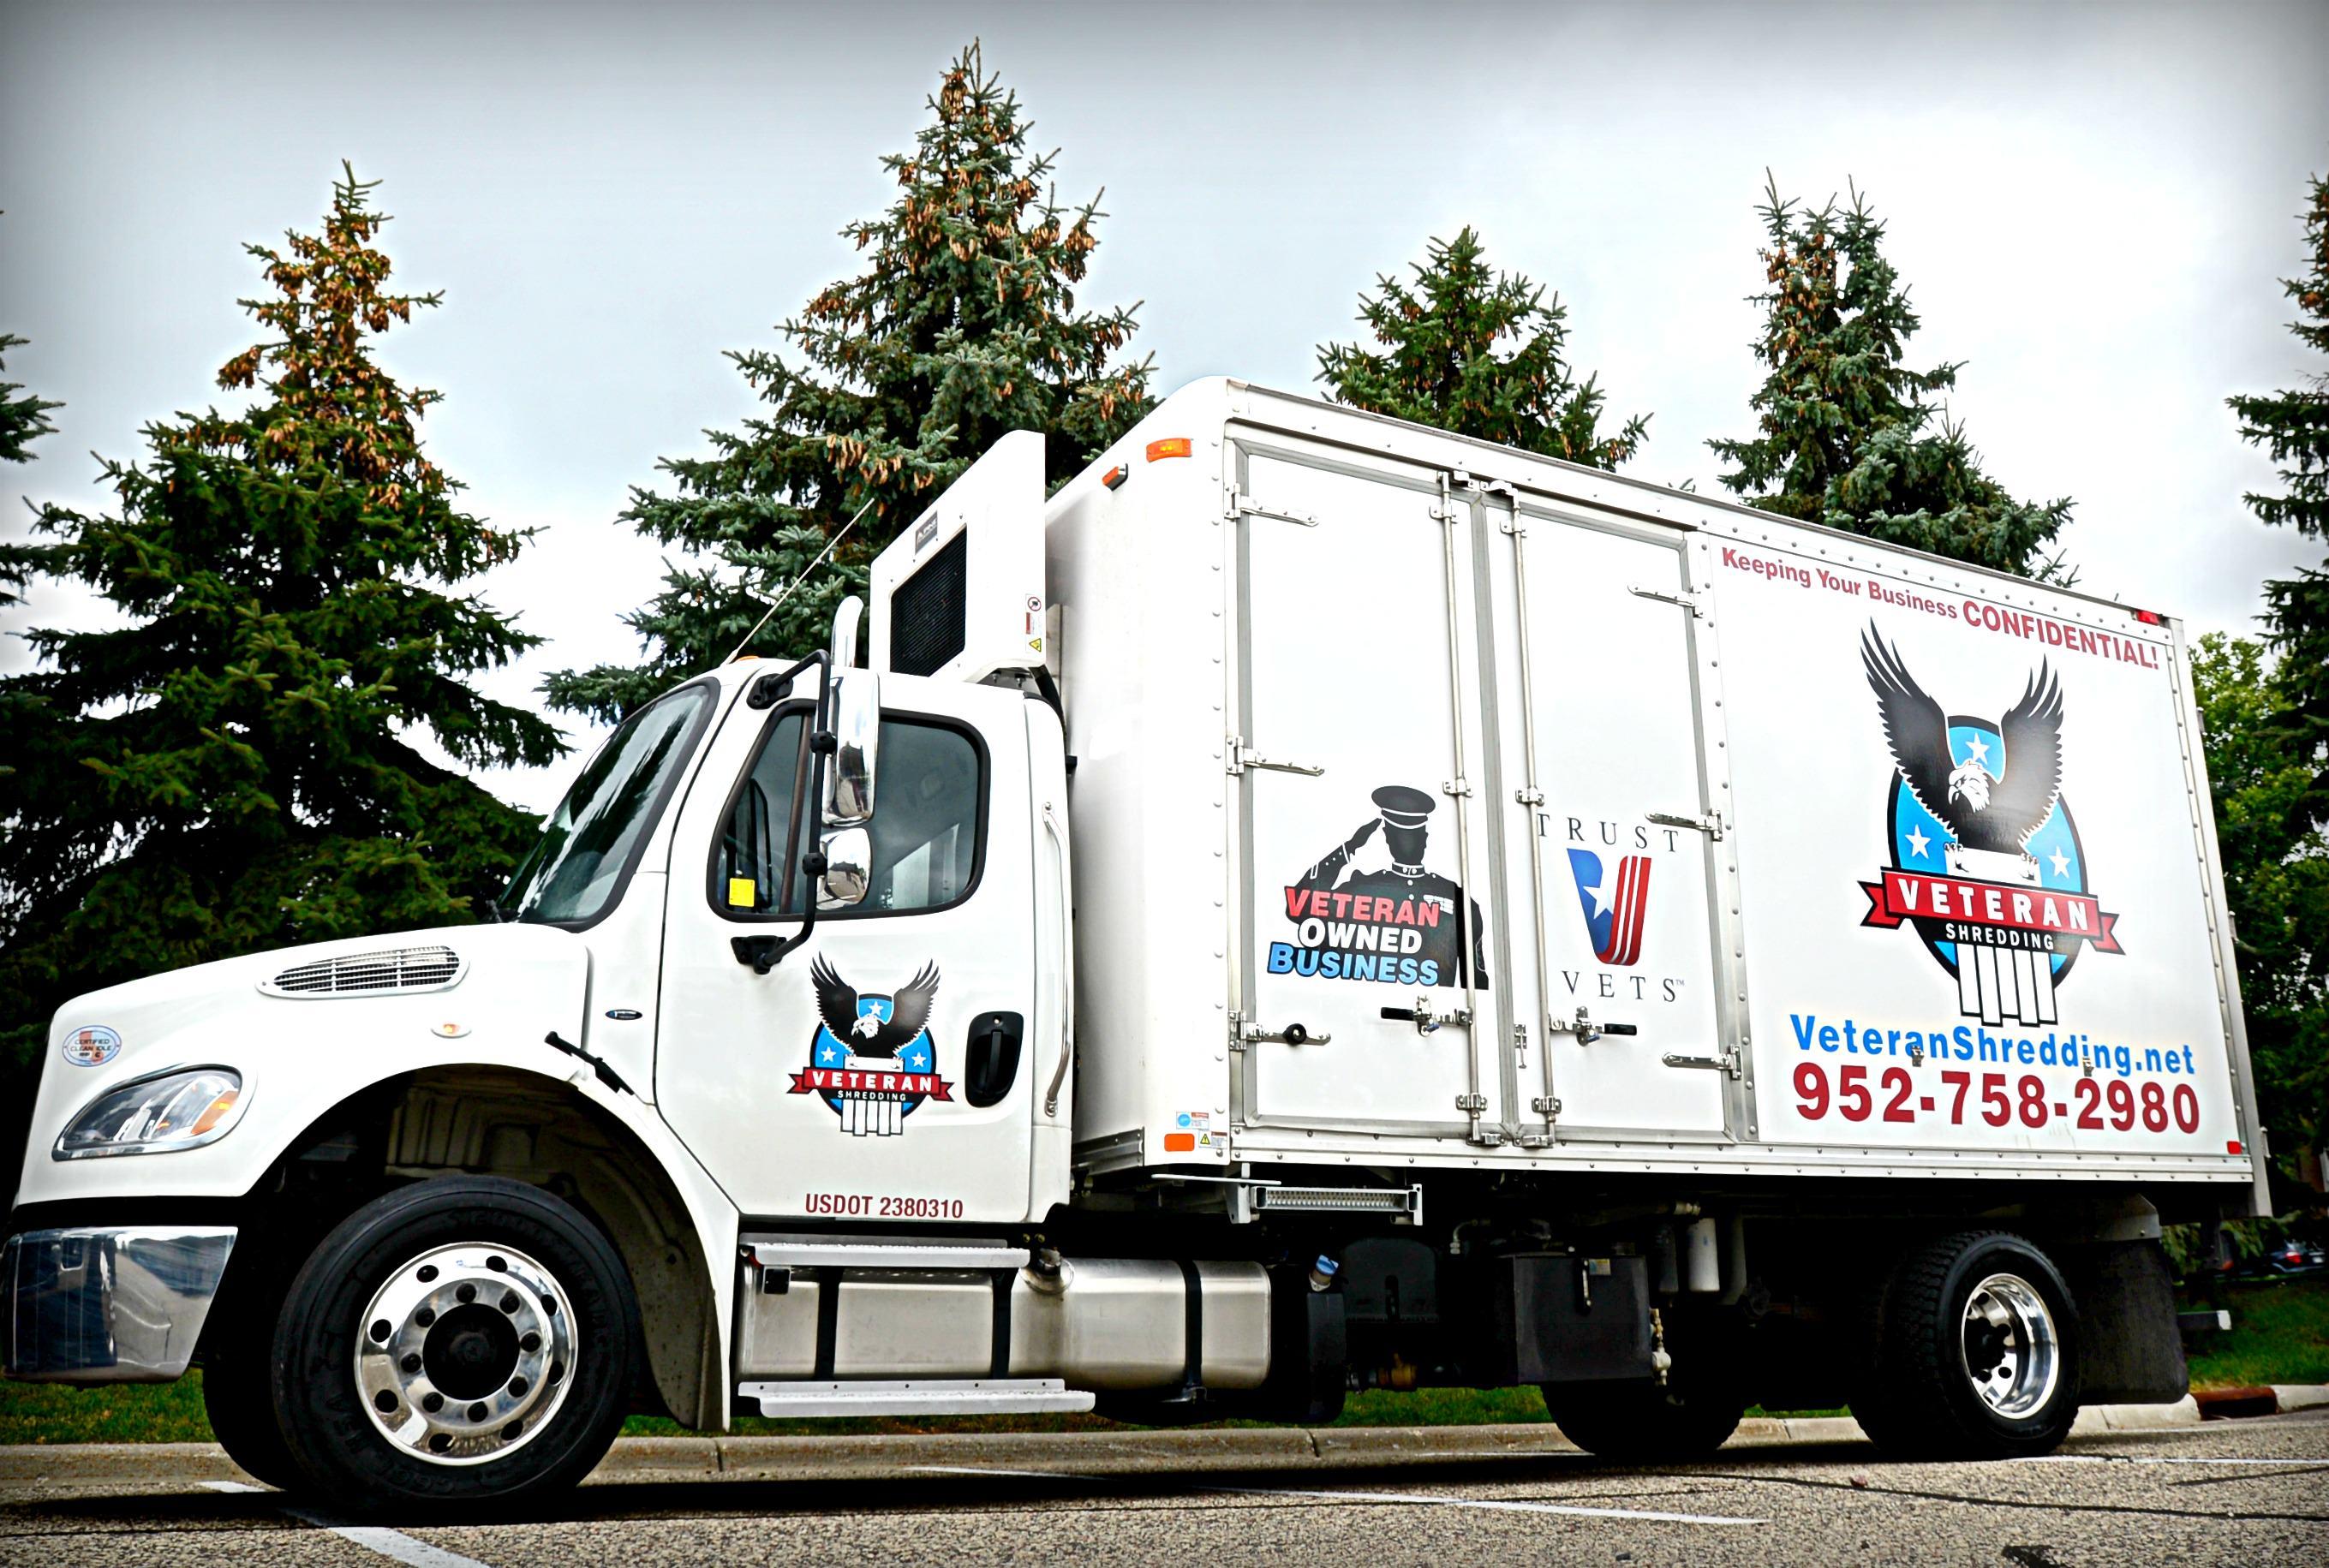 veteran shredding shred truck